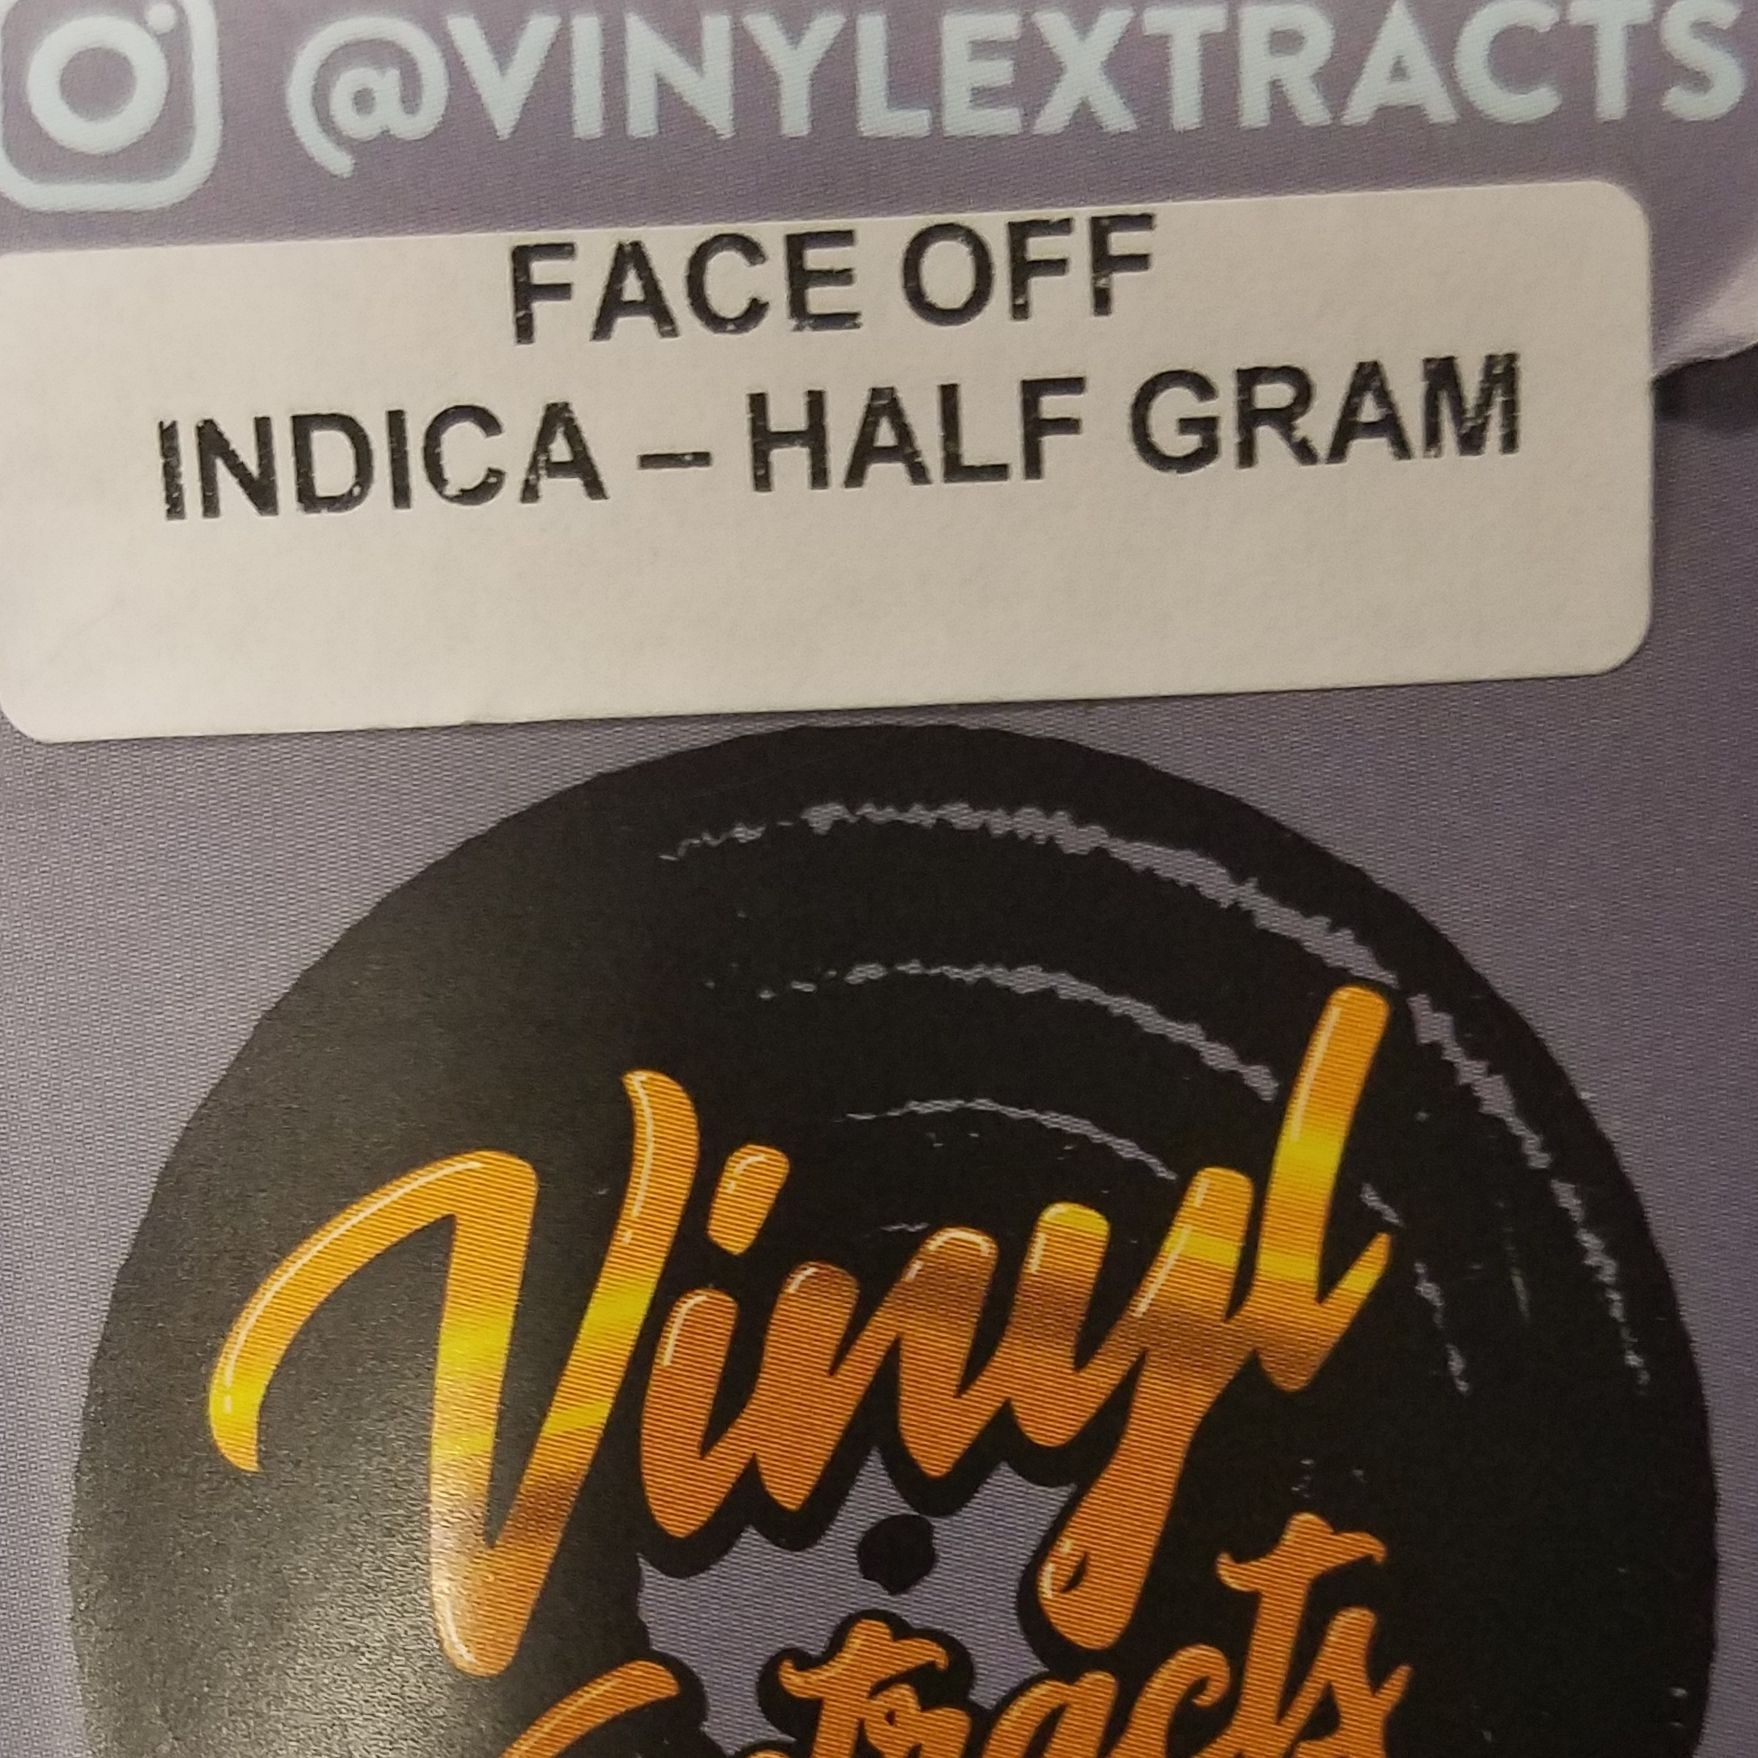 Vinyl Extracts-Face Off OG .5g Shatter (I)